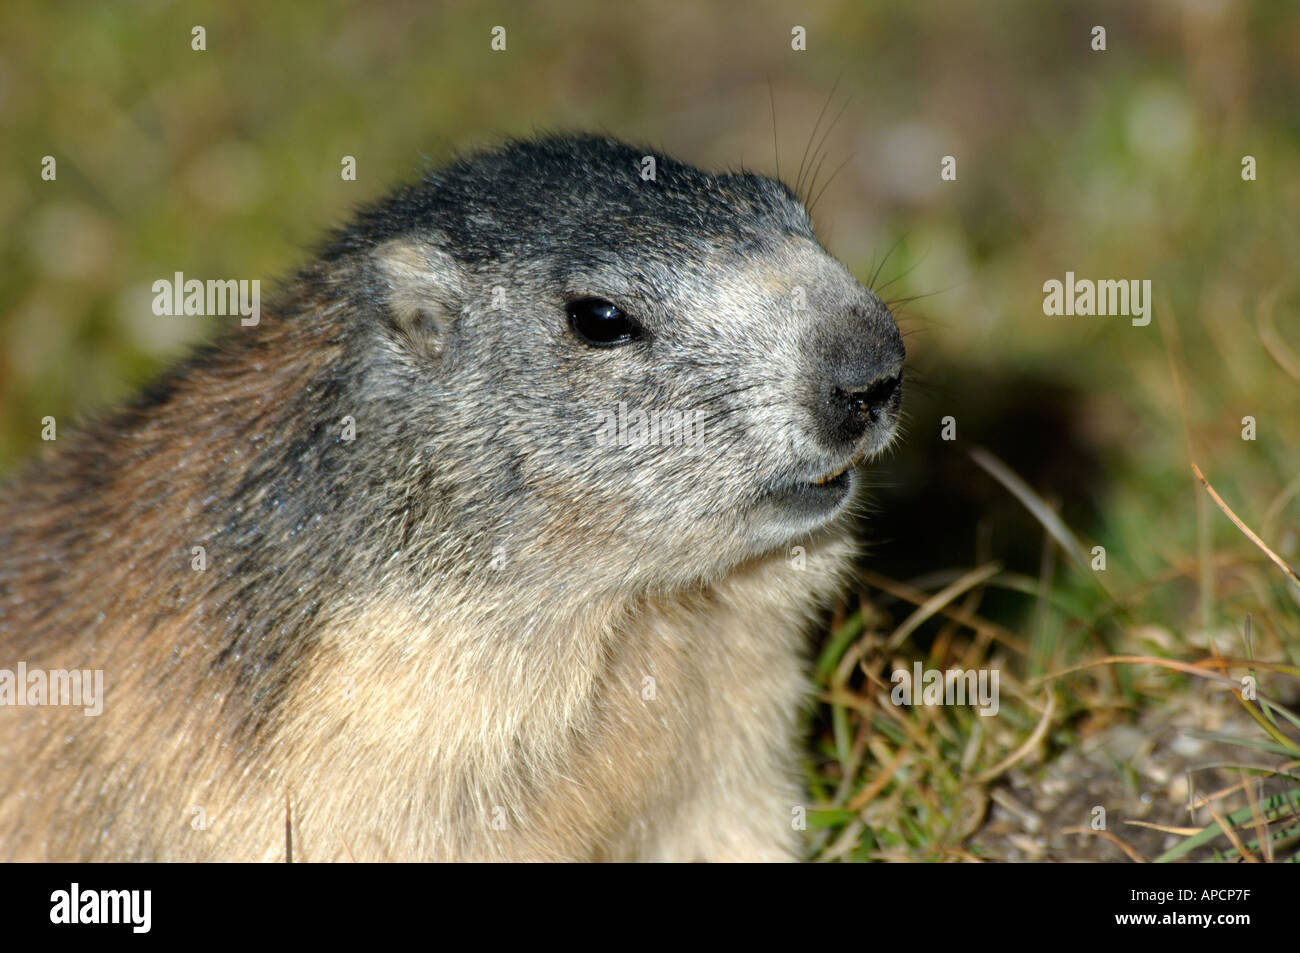 Closeup of alpine marmot, French alps Stock Photo: 5142142 - Alamy